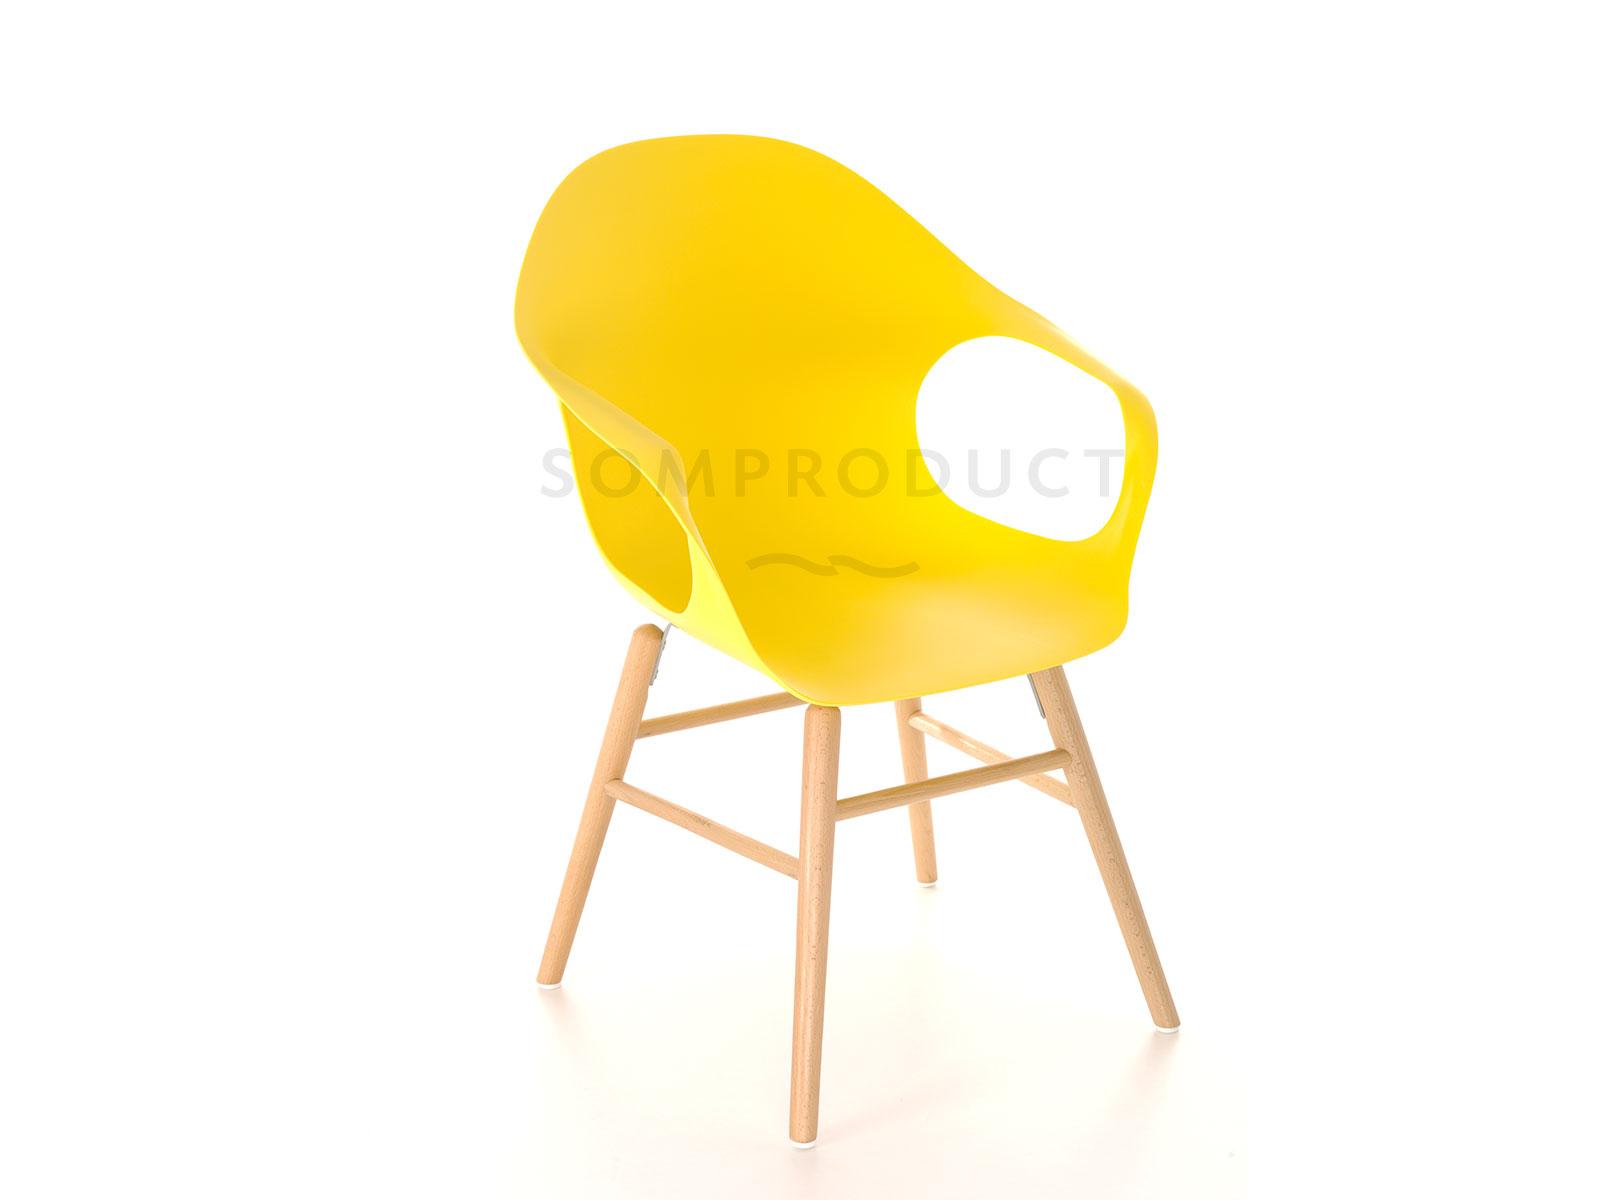 Scaun din plastic cu picioare de lemn Britt Yellow, l58,5xA62,5xH86 cm